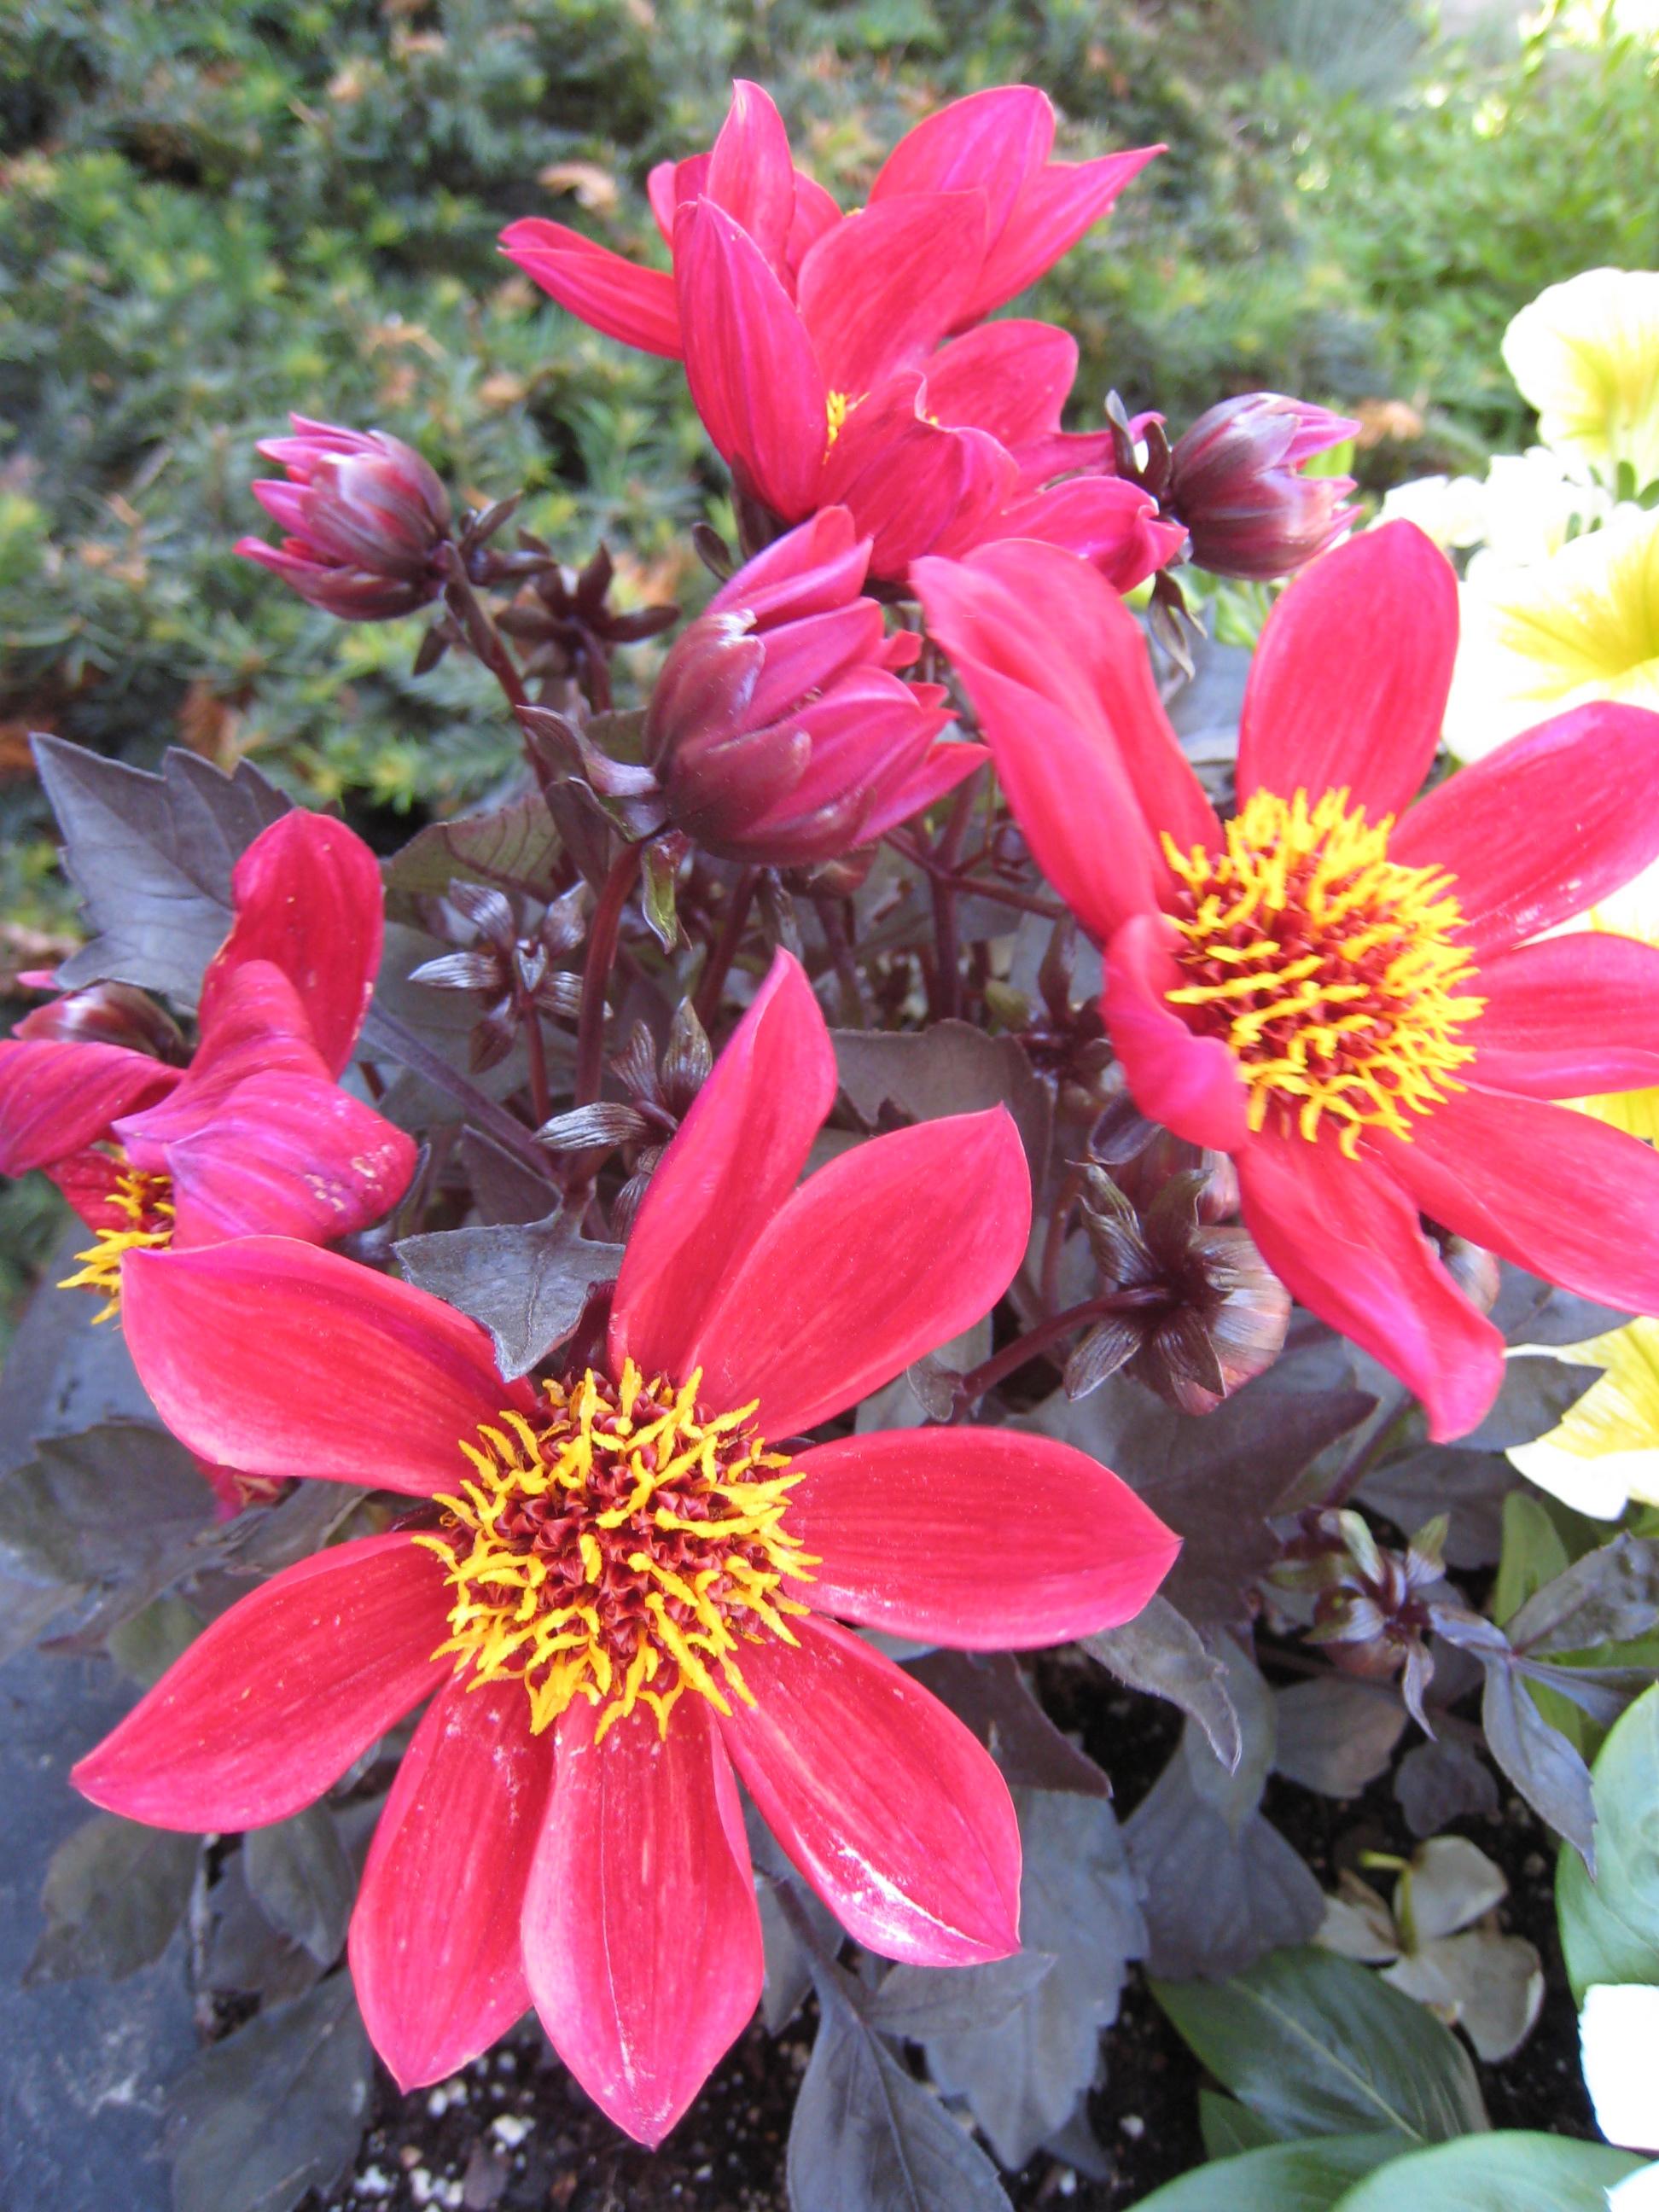 Red flowers closeup, Flowers, Garden, HQ Photo